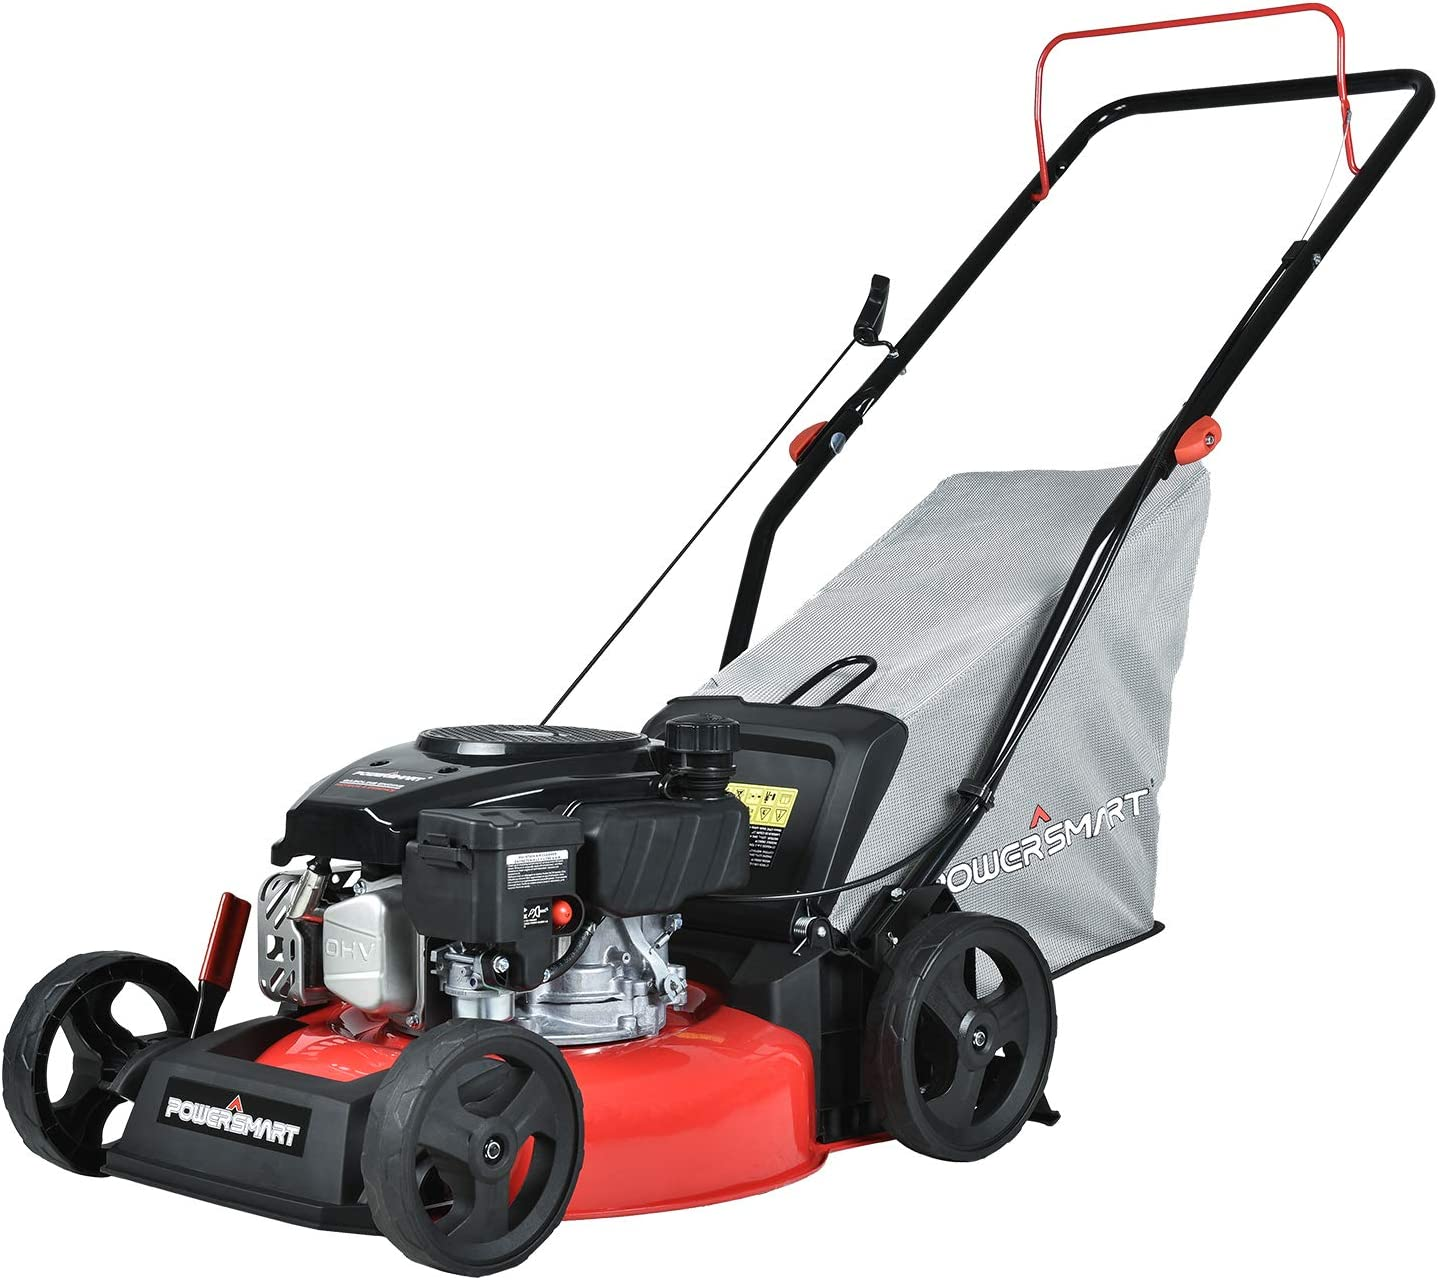 PowerSmart 17-inch & 127CC, Homeuse Gas Powered Push Lawn Mower